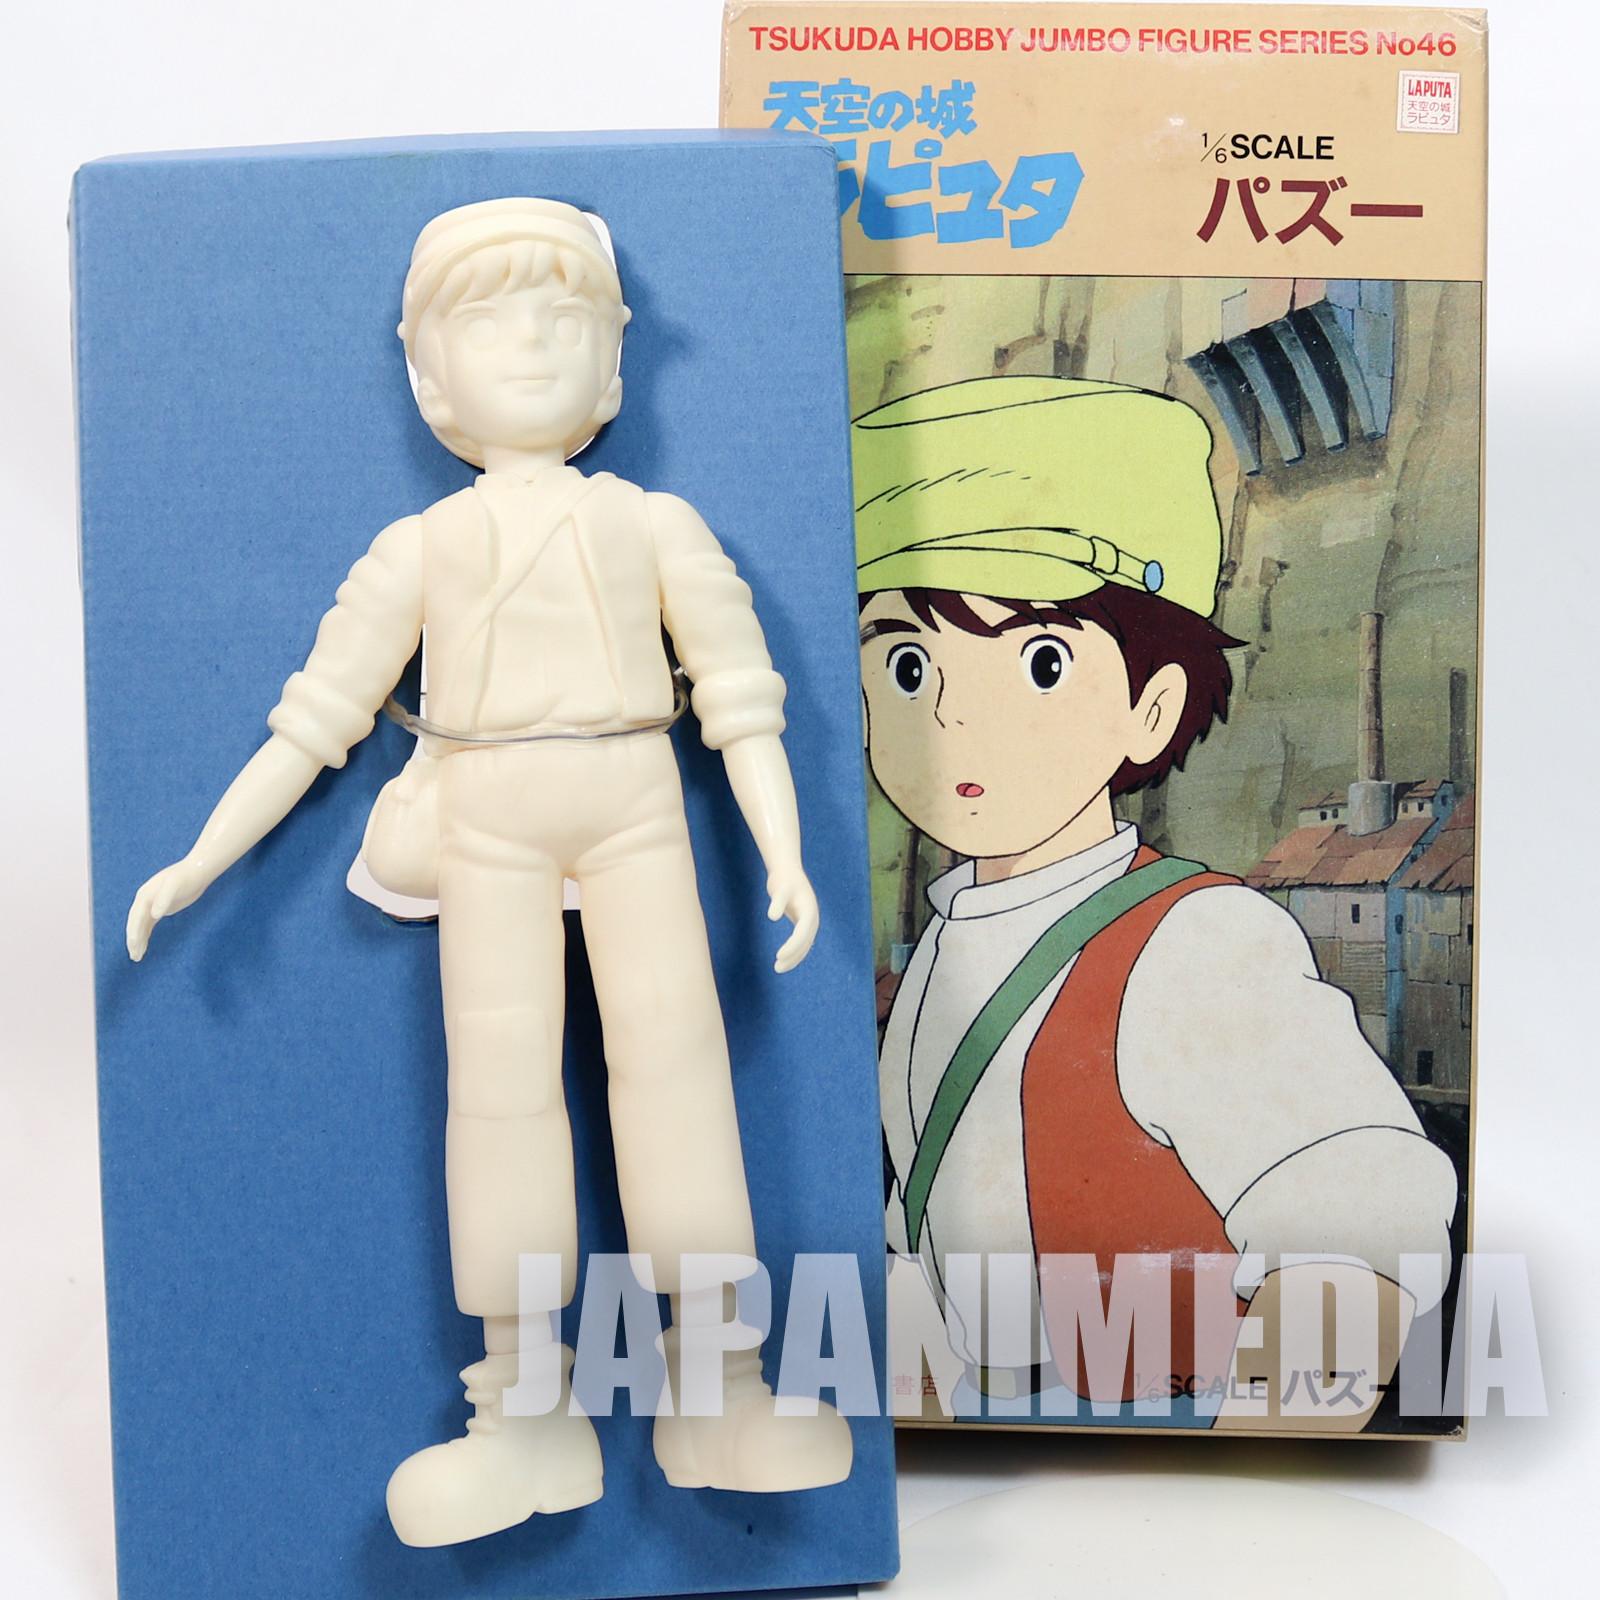 RARE Laputa : Castle in the Sky Pazu 1/6 Model Kit Tsukuda Hobby Ghibli FIGURE